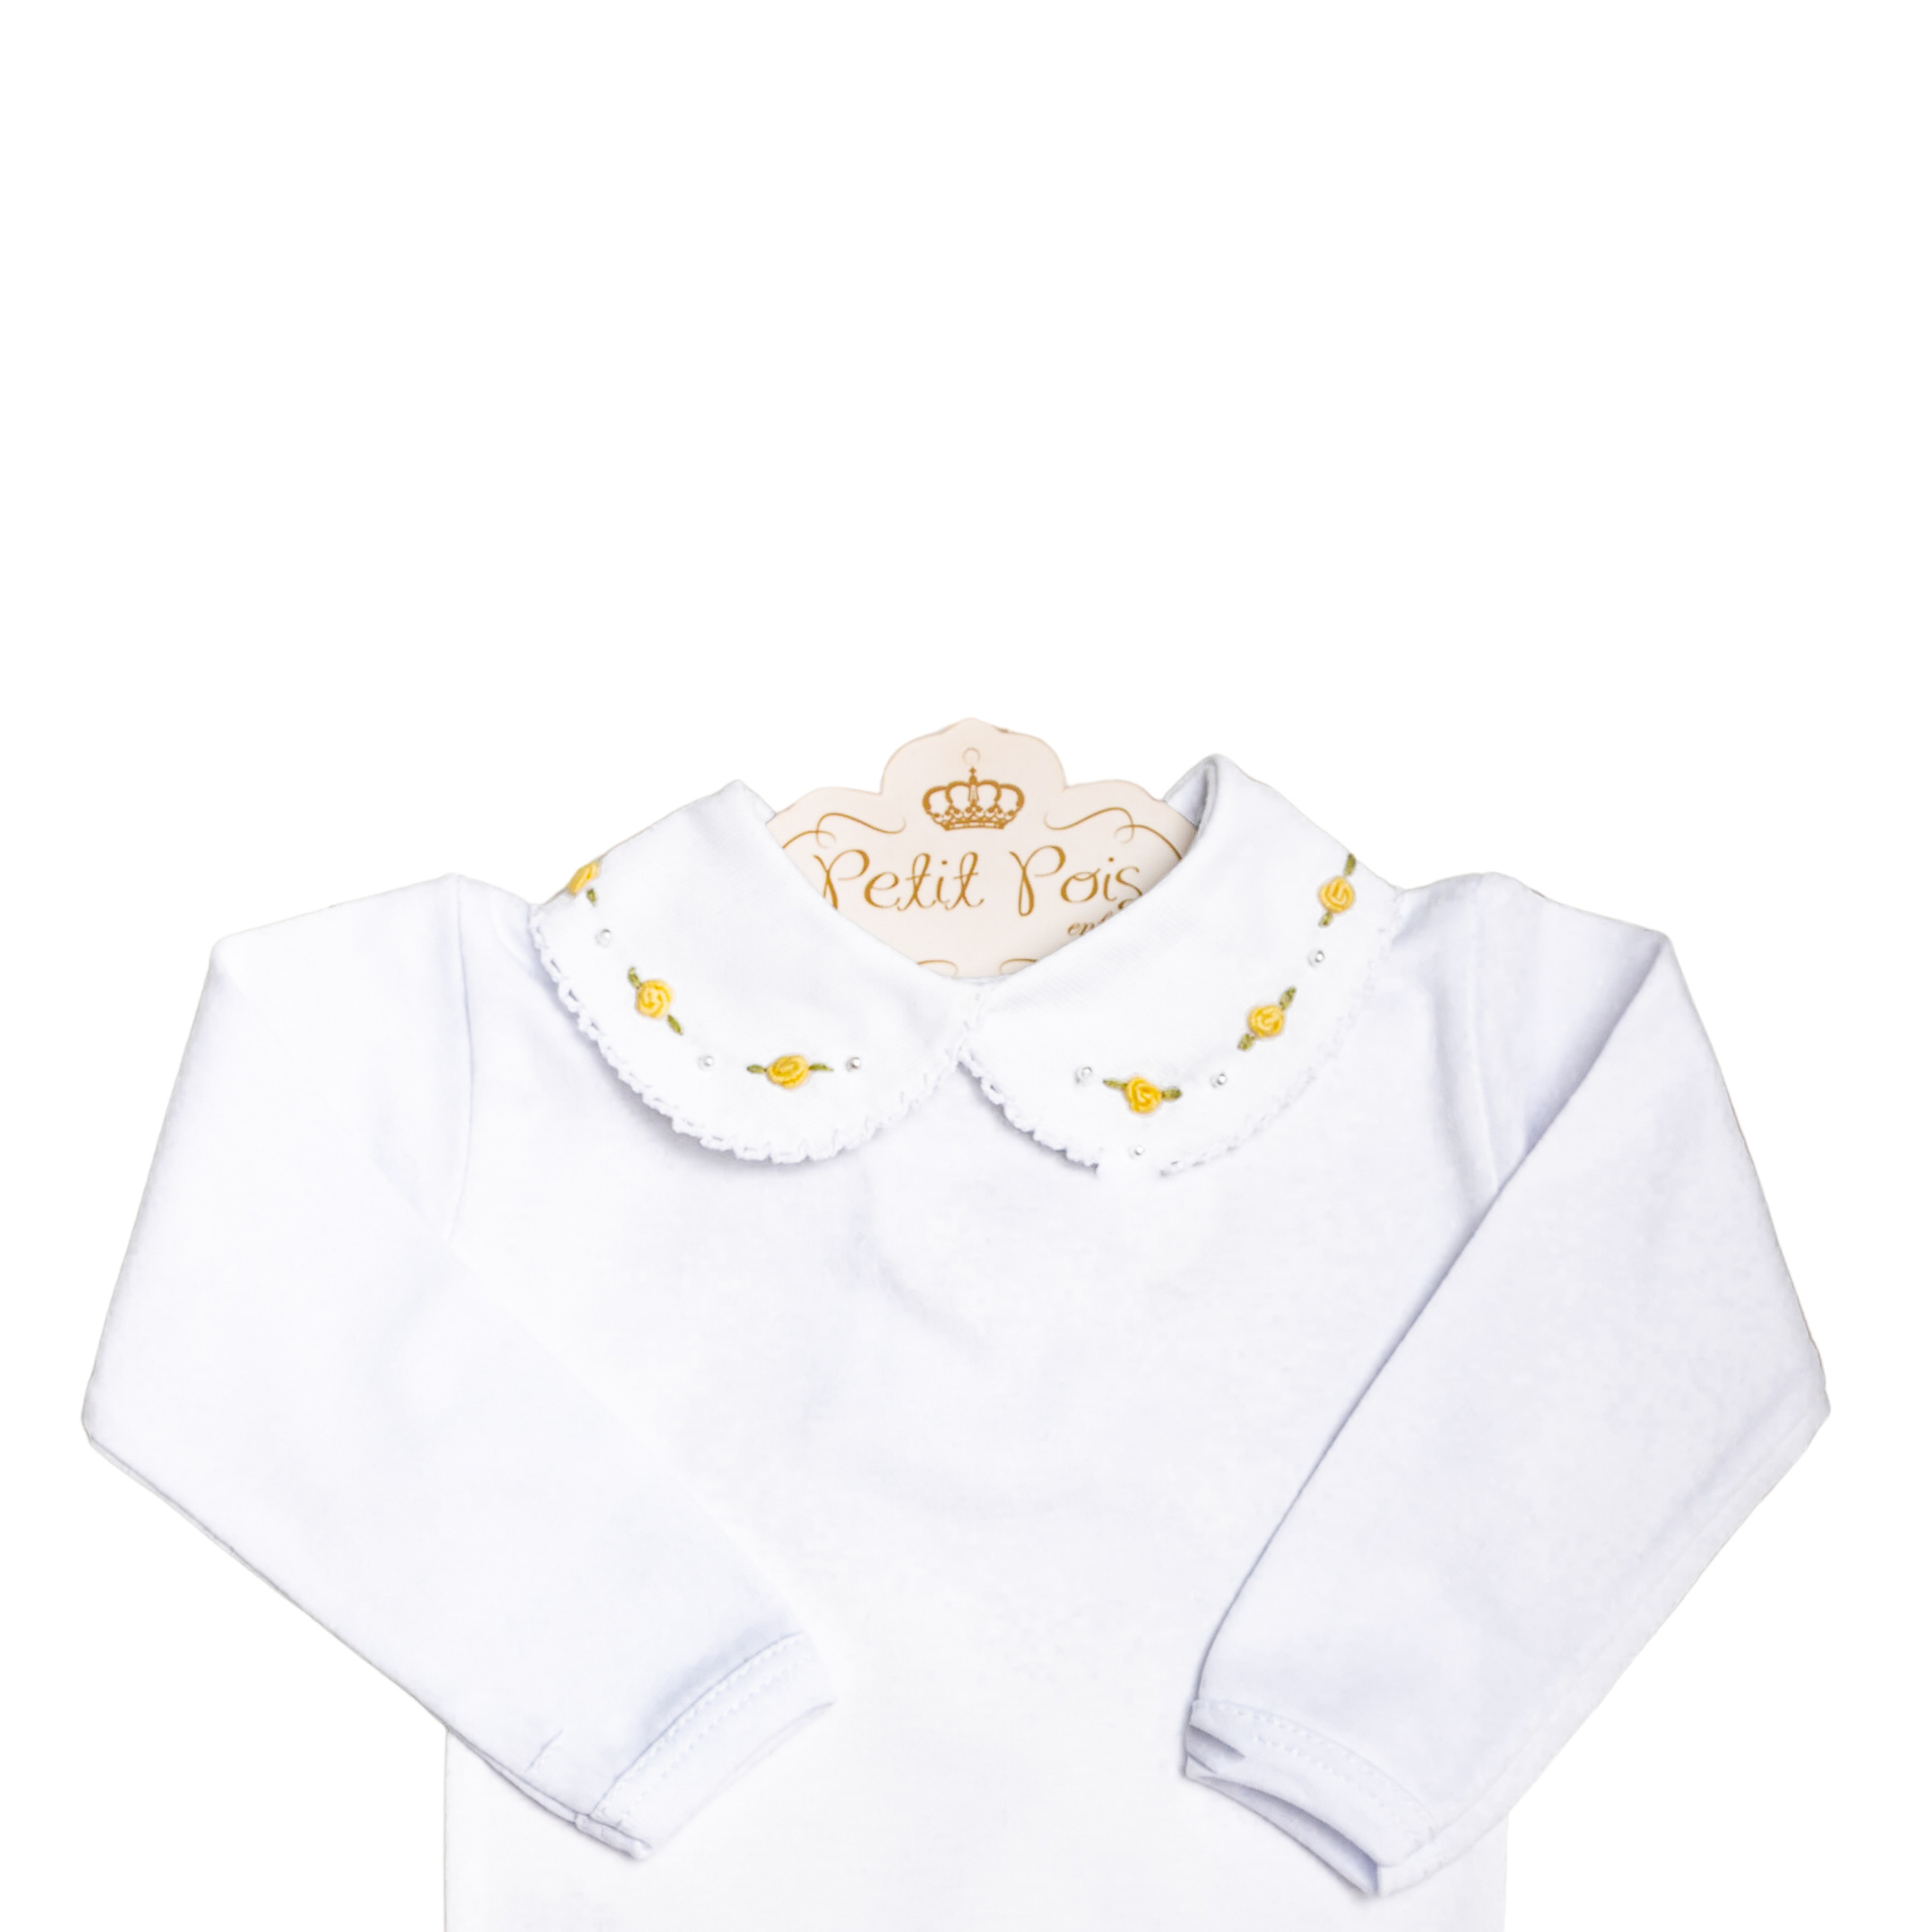 Body bebê flor e pérola - Branco e amarelo